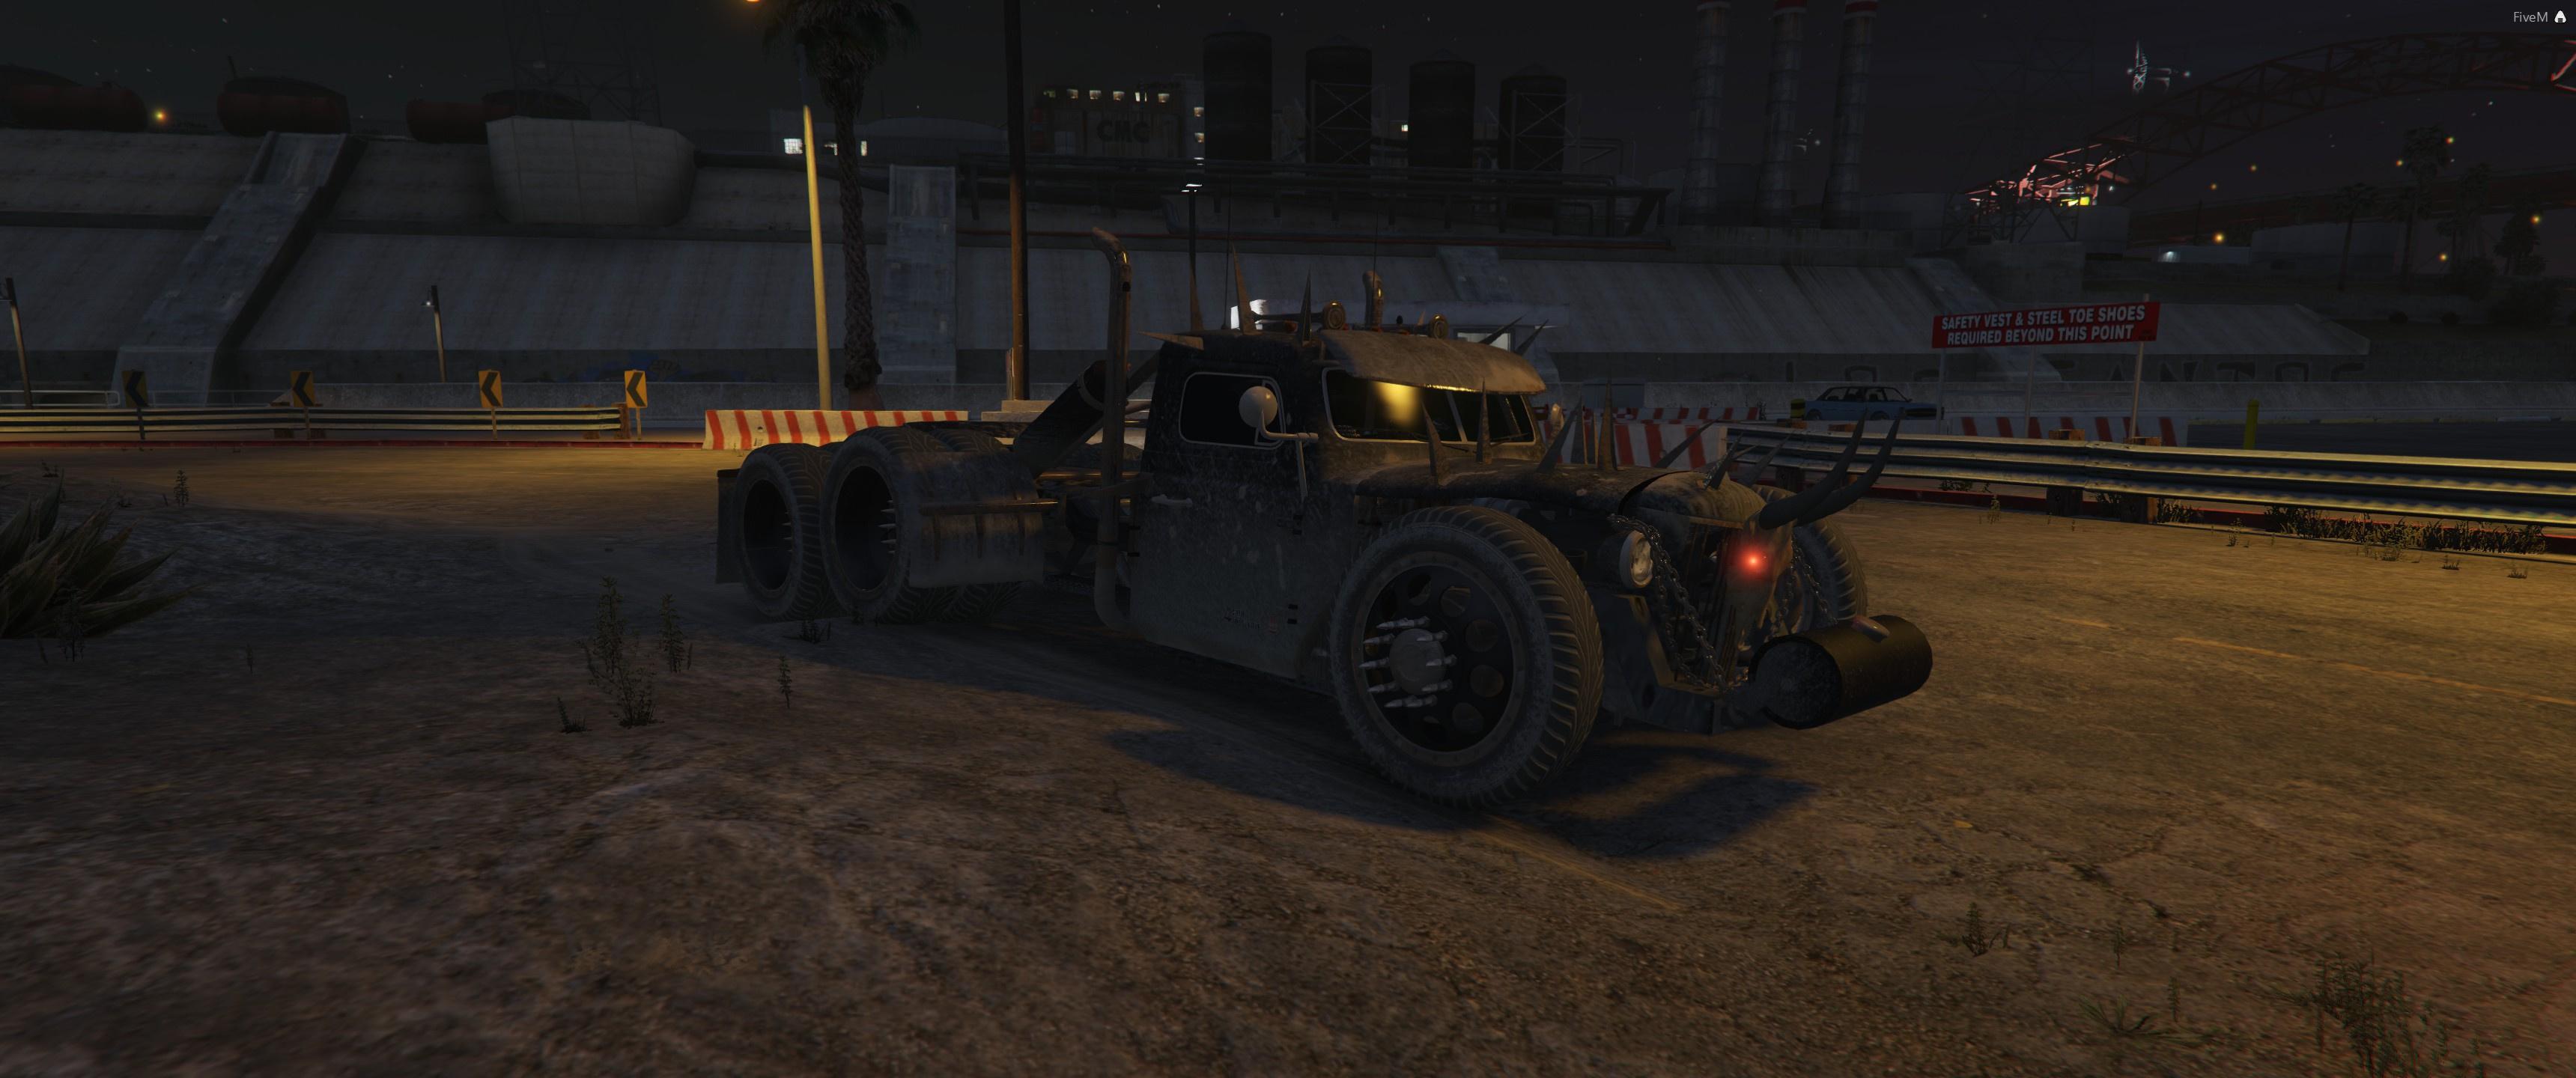 Ratty Ratloader V1 0 [Addon | Extras] - GTA5-Mods com